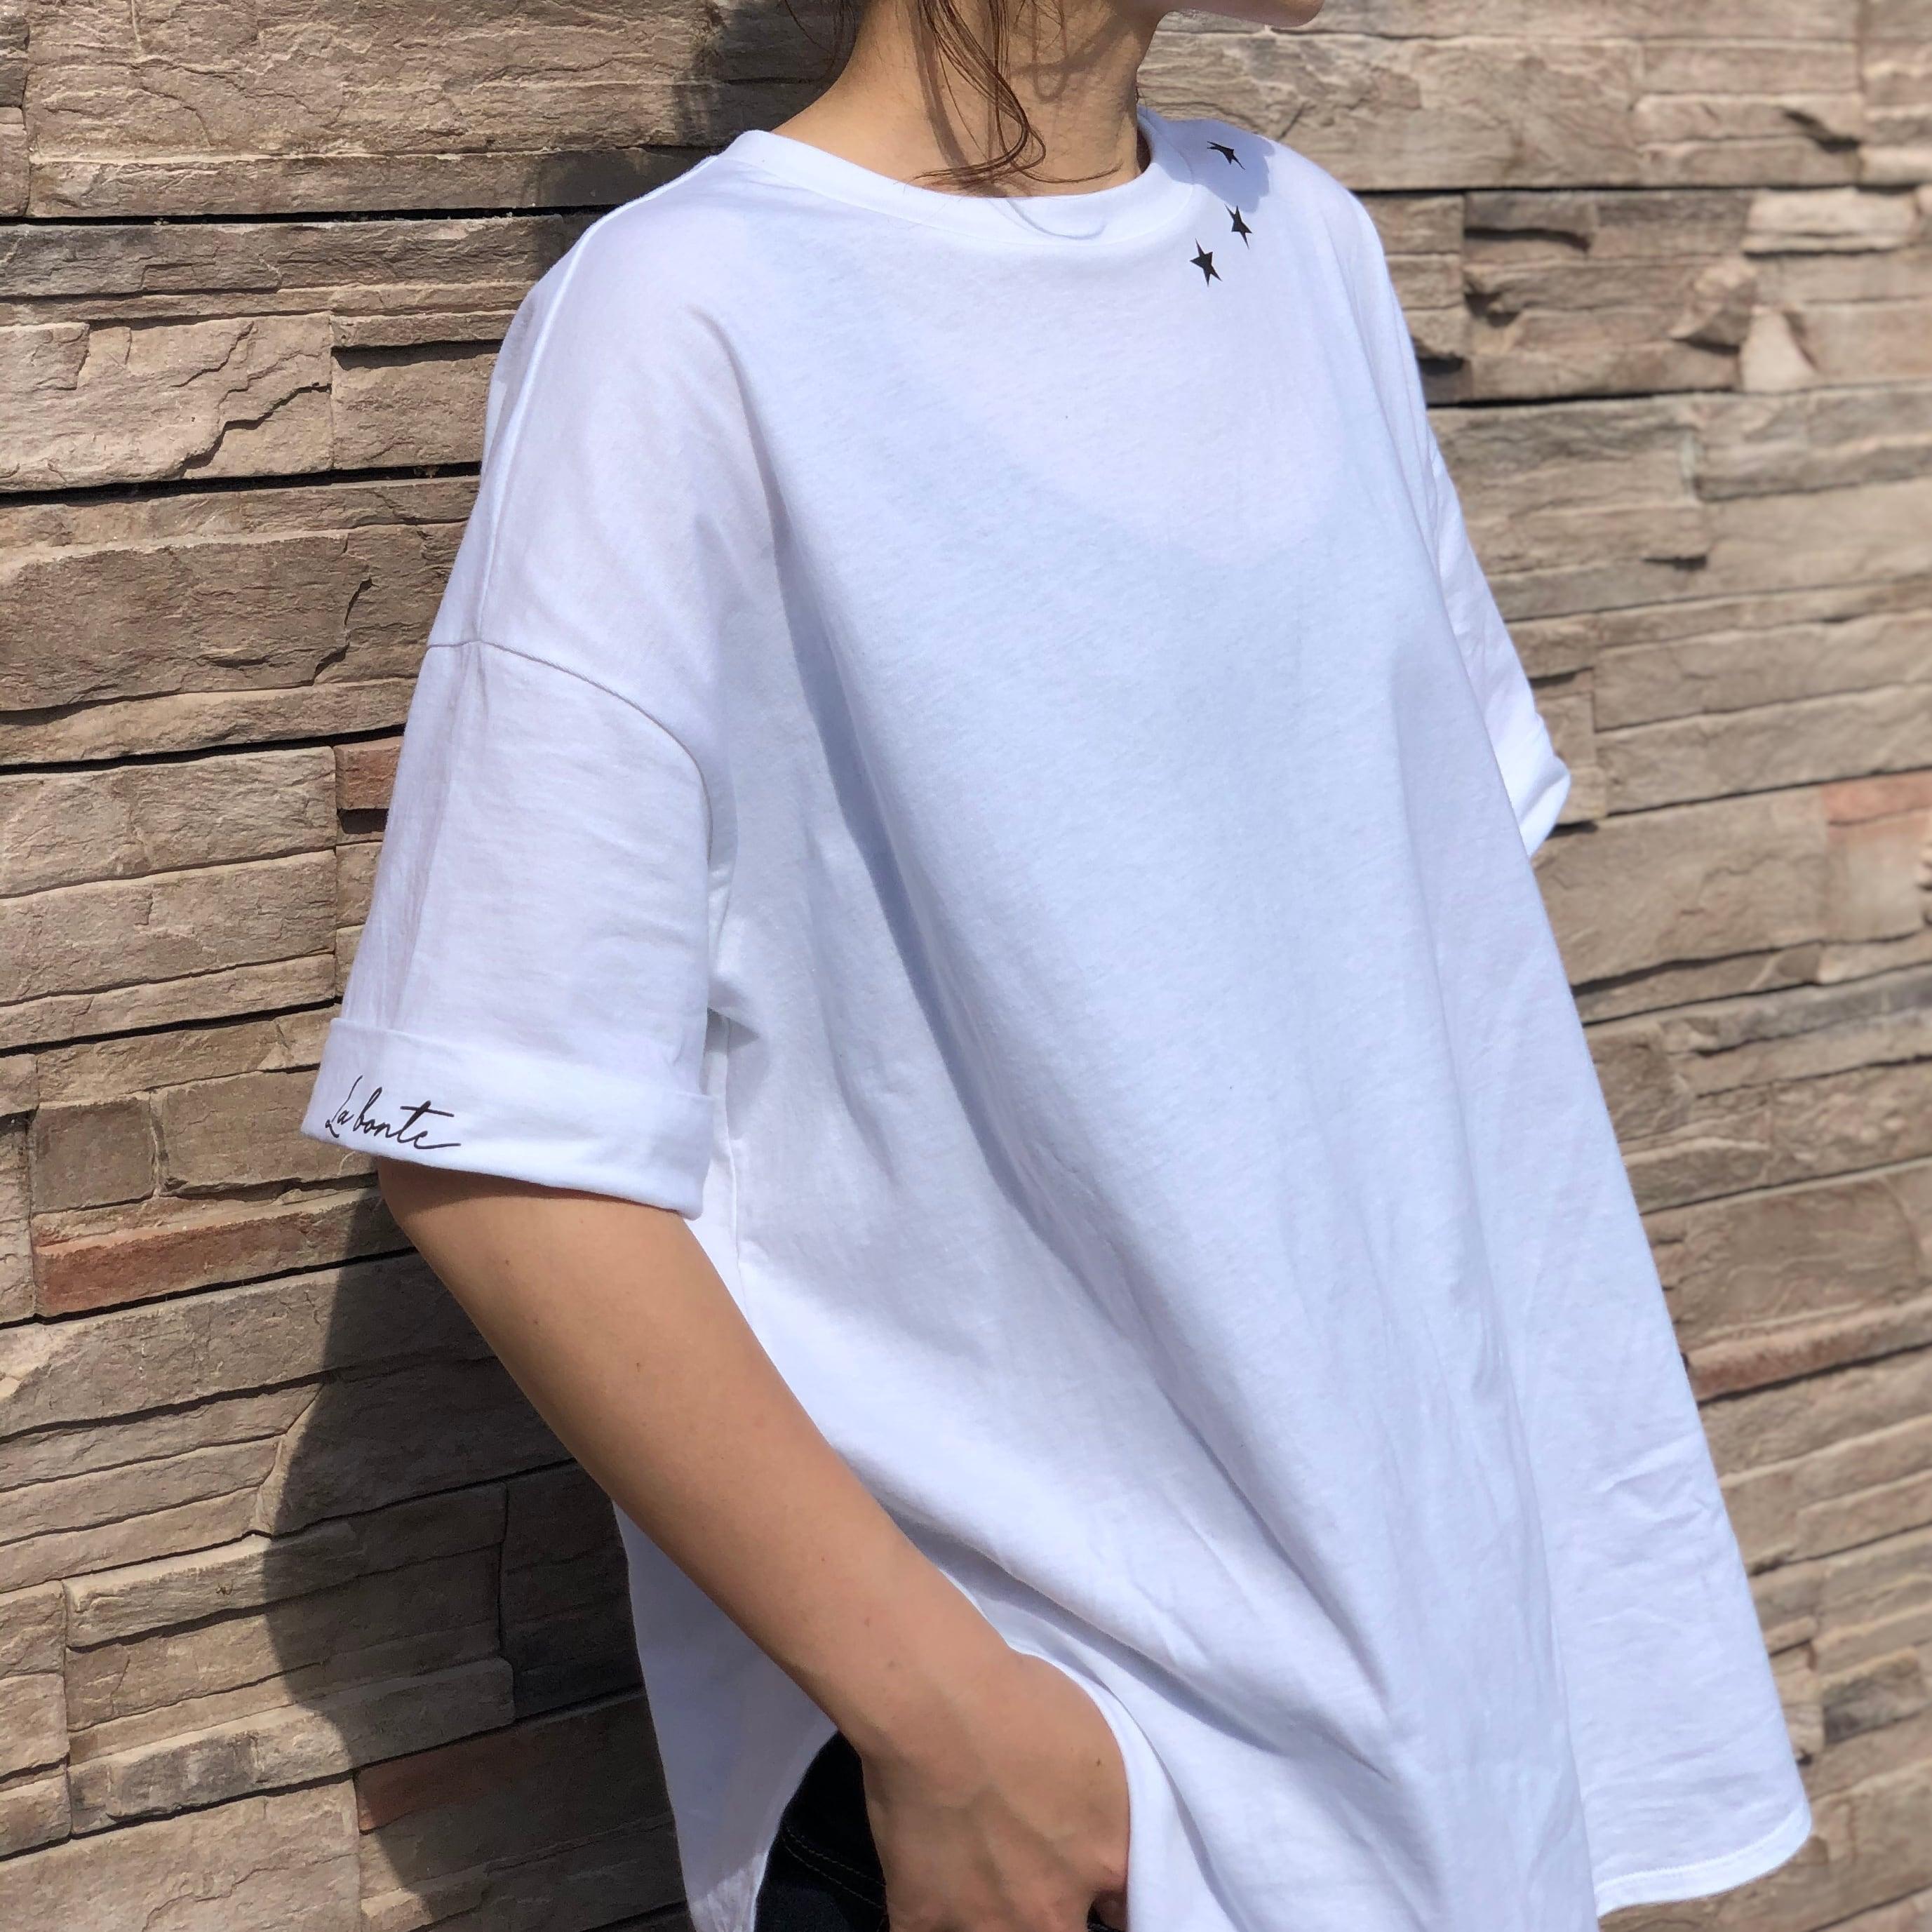 【 siro de labonte 】- R113227 - triple star Tシャツ